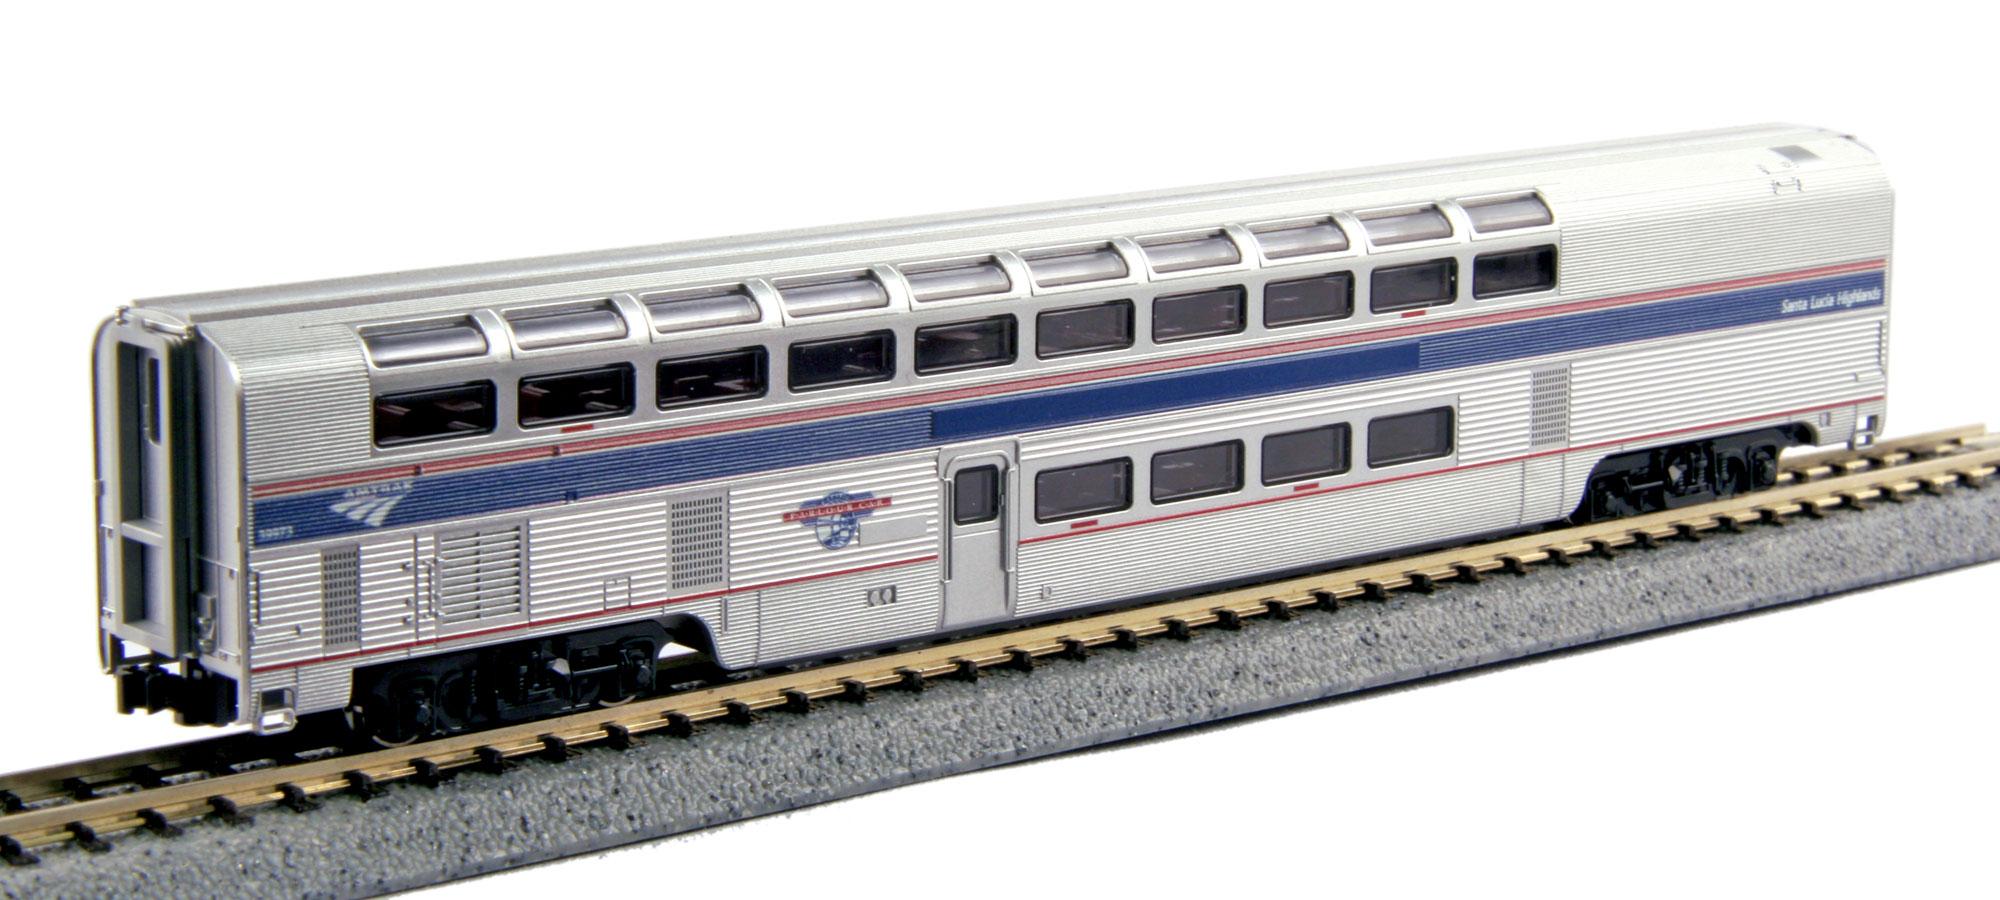 N Scale - Kato USA - 156-0950 - Passenger Car, Lightweight, Amtrak Superliner - Amtrak - 39973